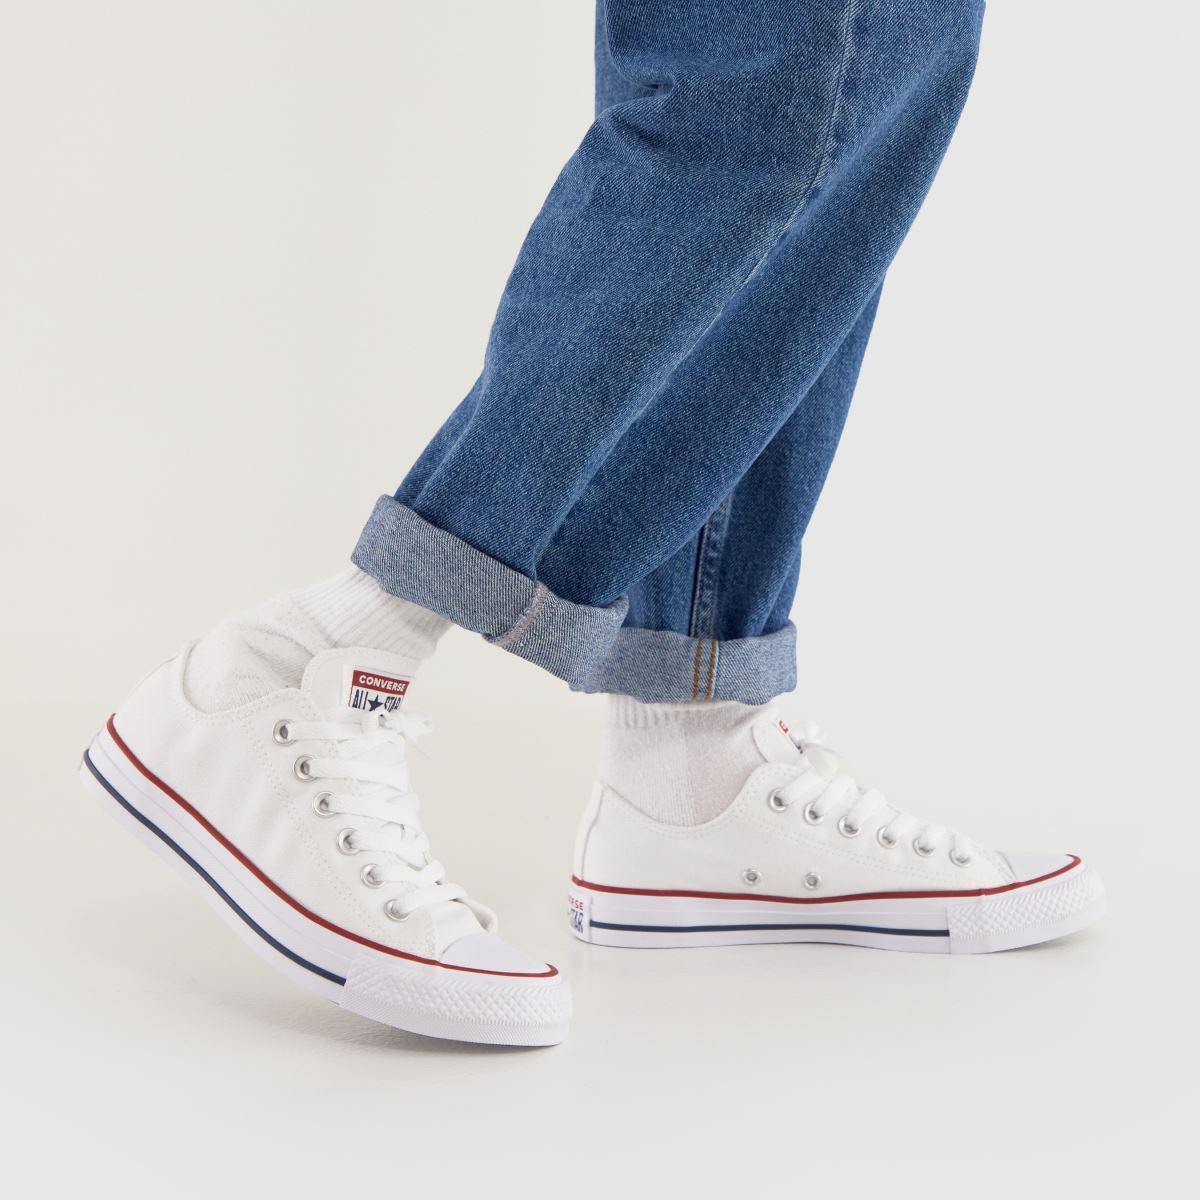 Damen Weiß converse All Star Oxford Sneaker | schuh Gute Qualität beliebte Schuhe